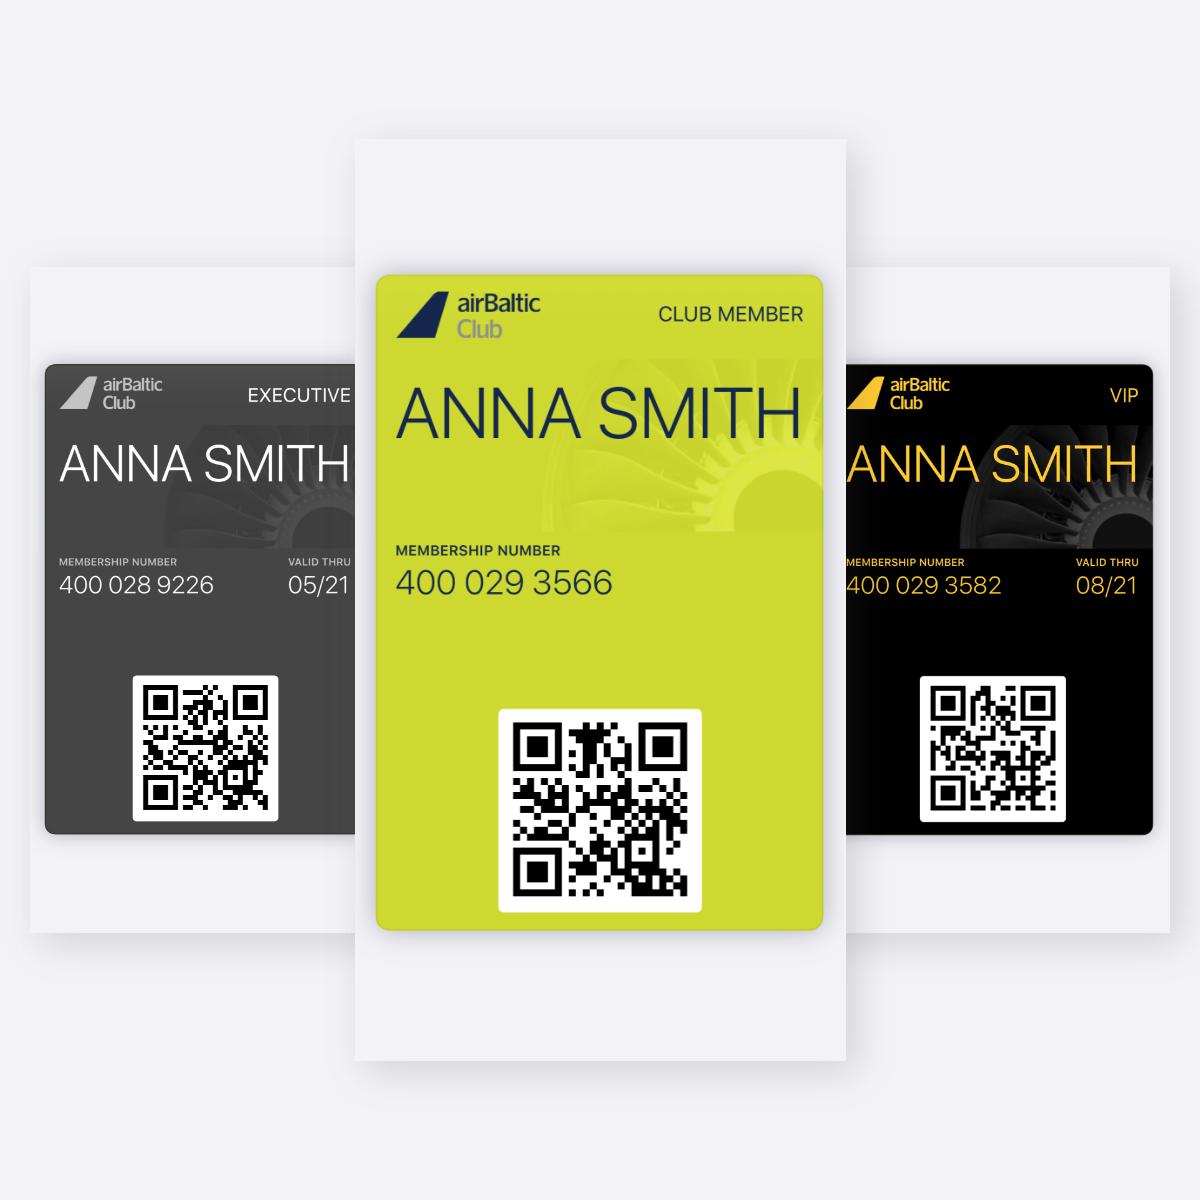 Загрузите свою цифровую карту airBaltic Club image